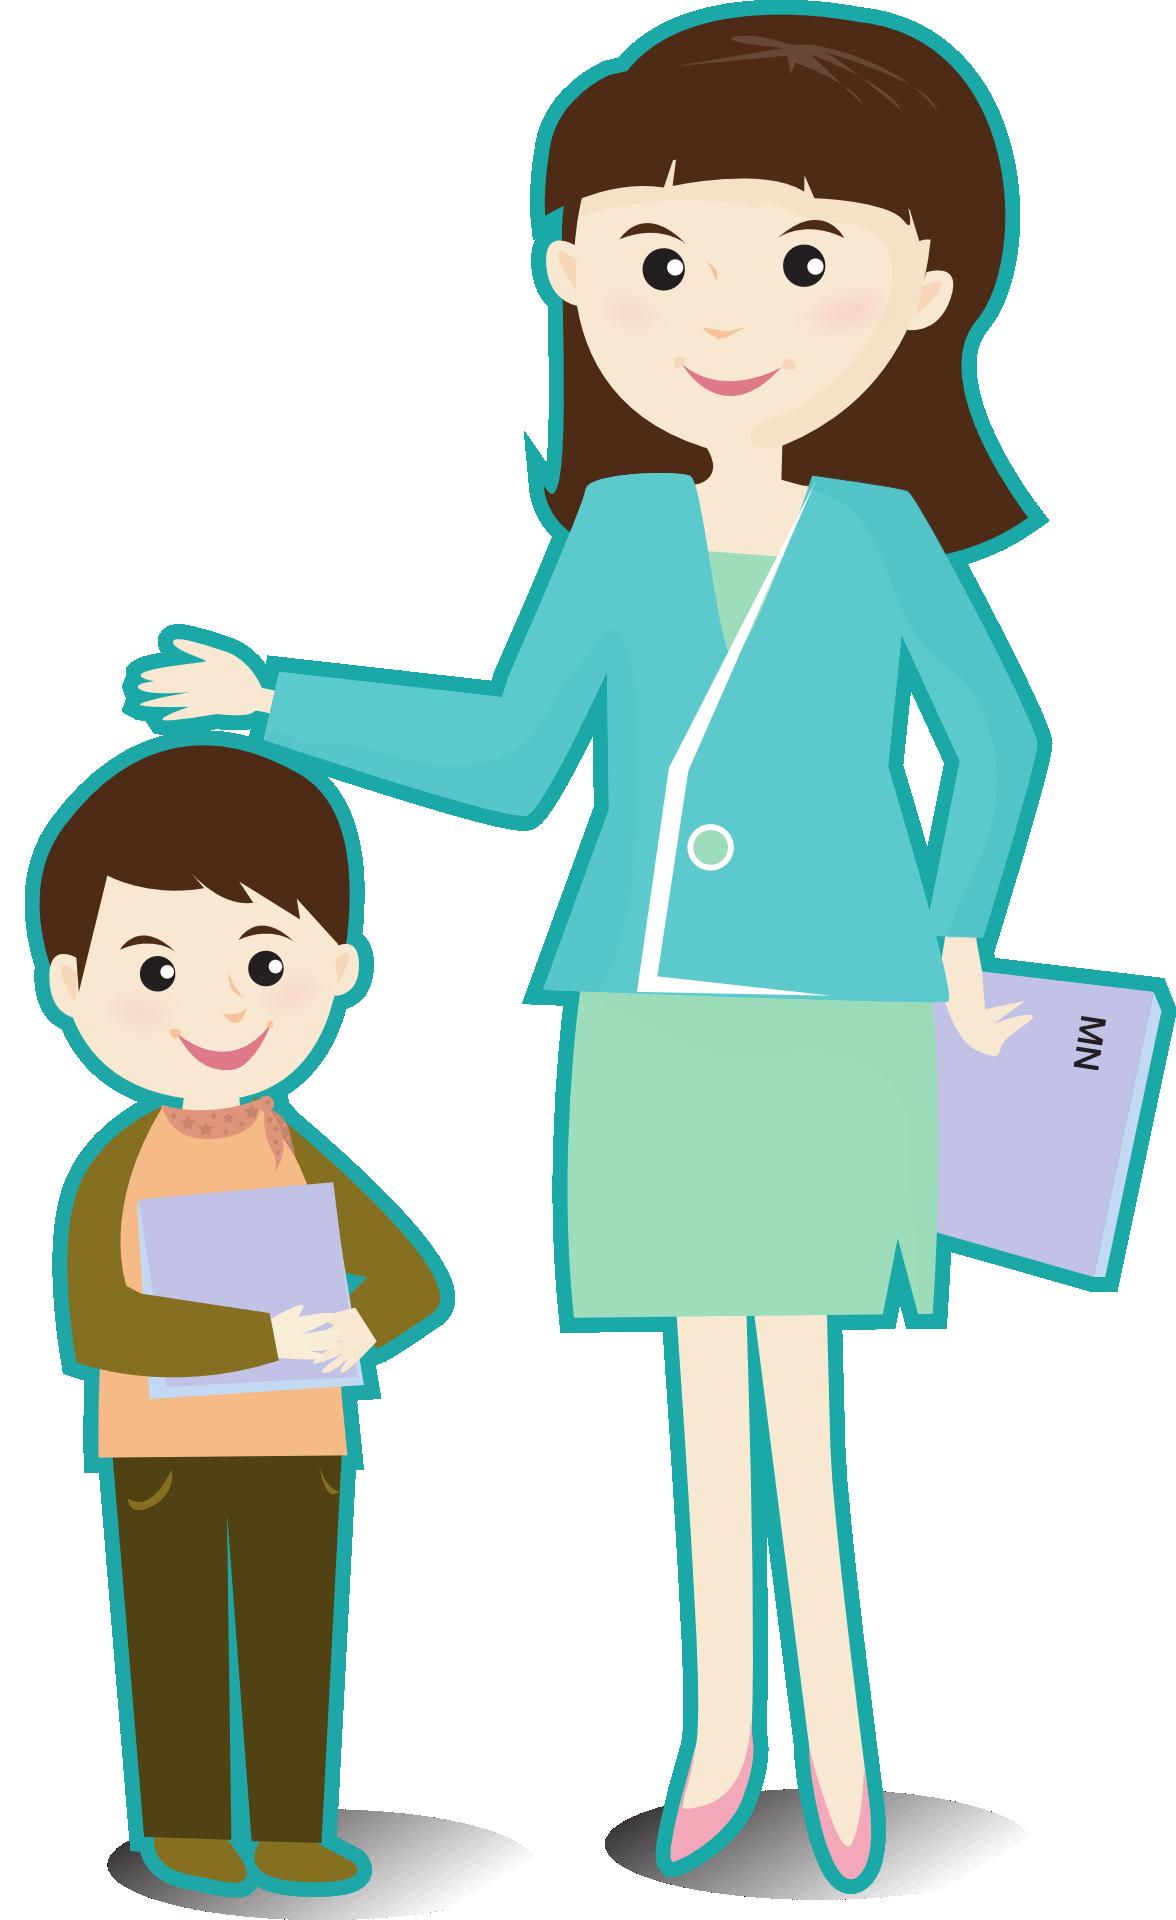 vector download Teacher helping student adamsmanor. Teachers and students clipart